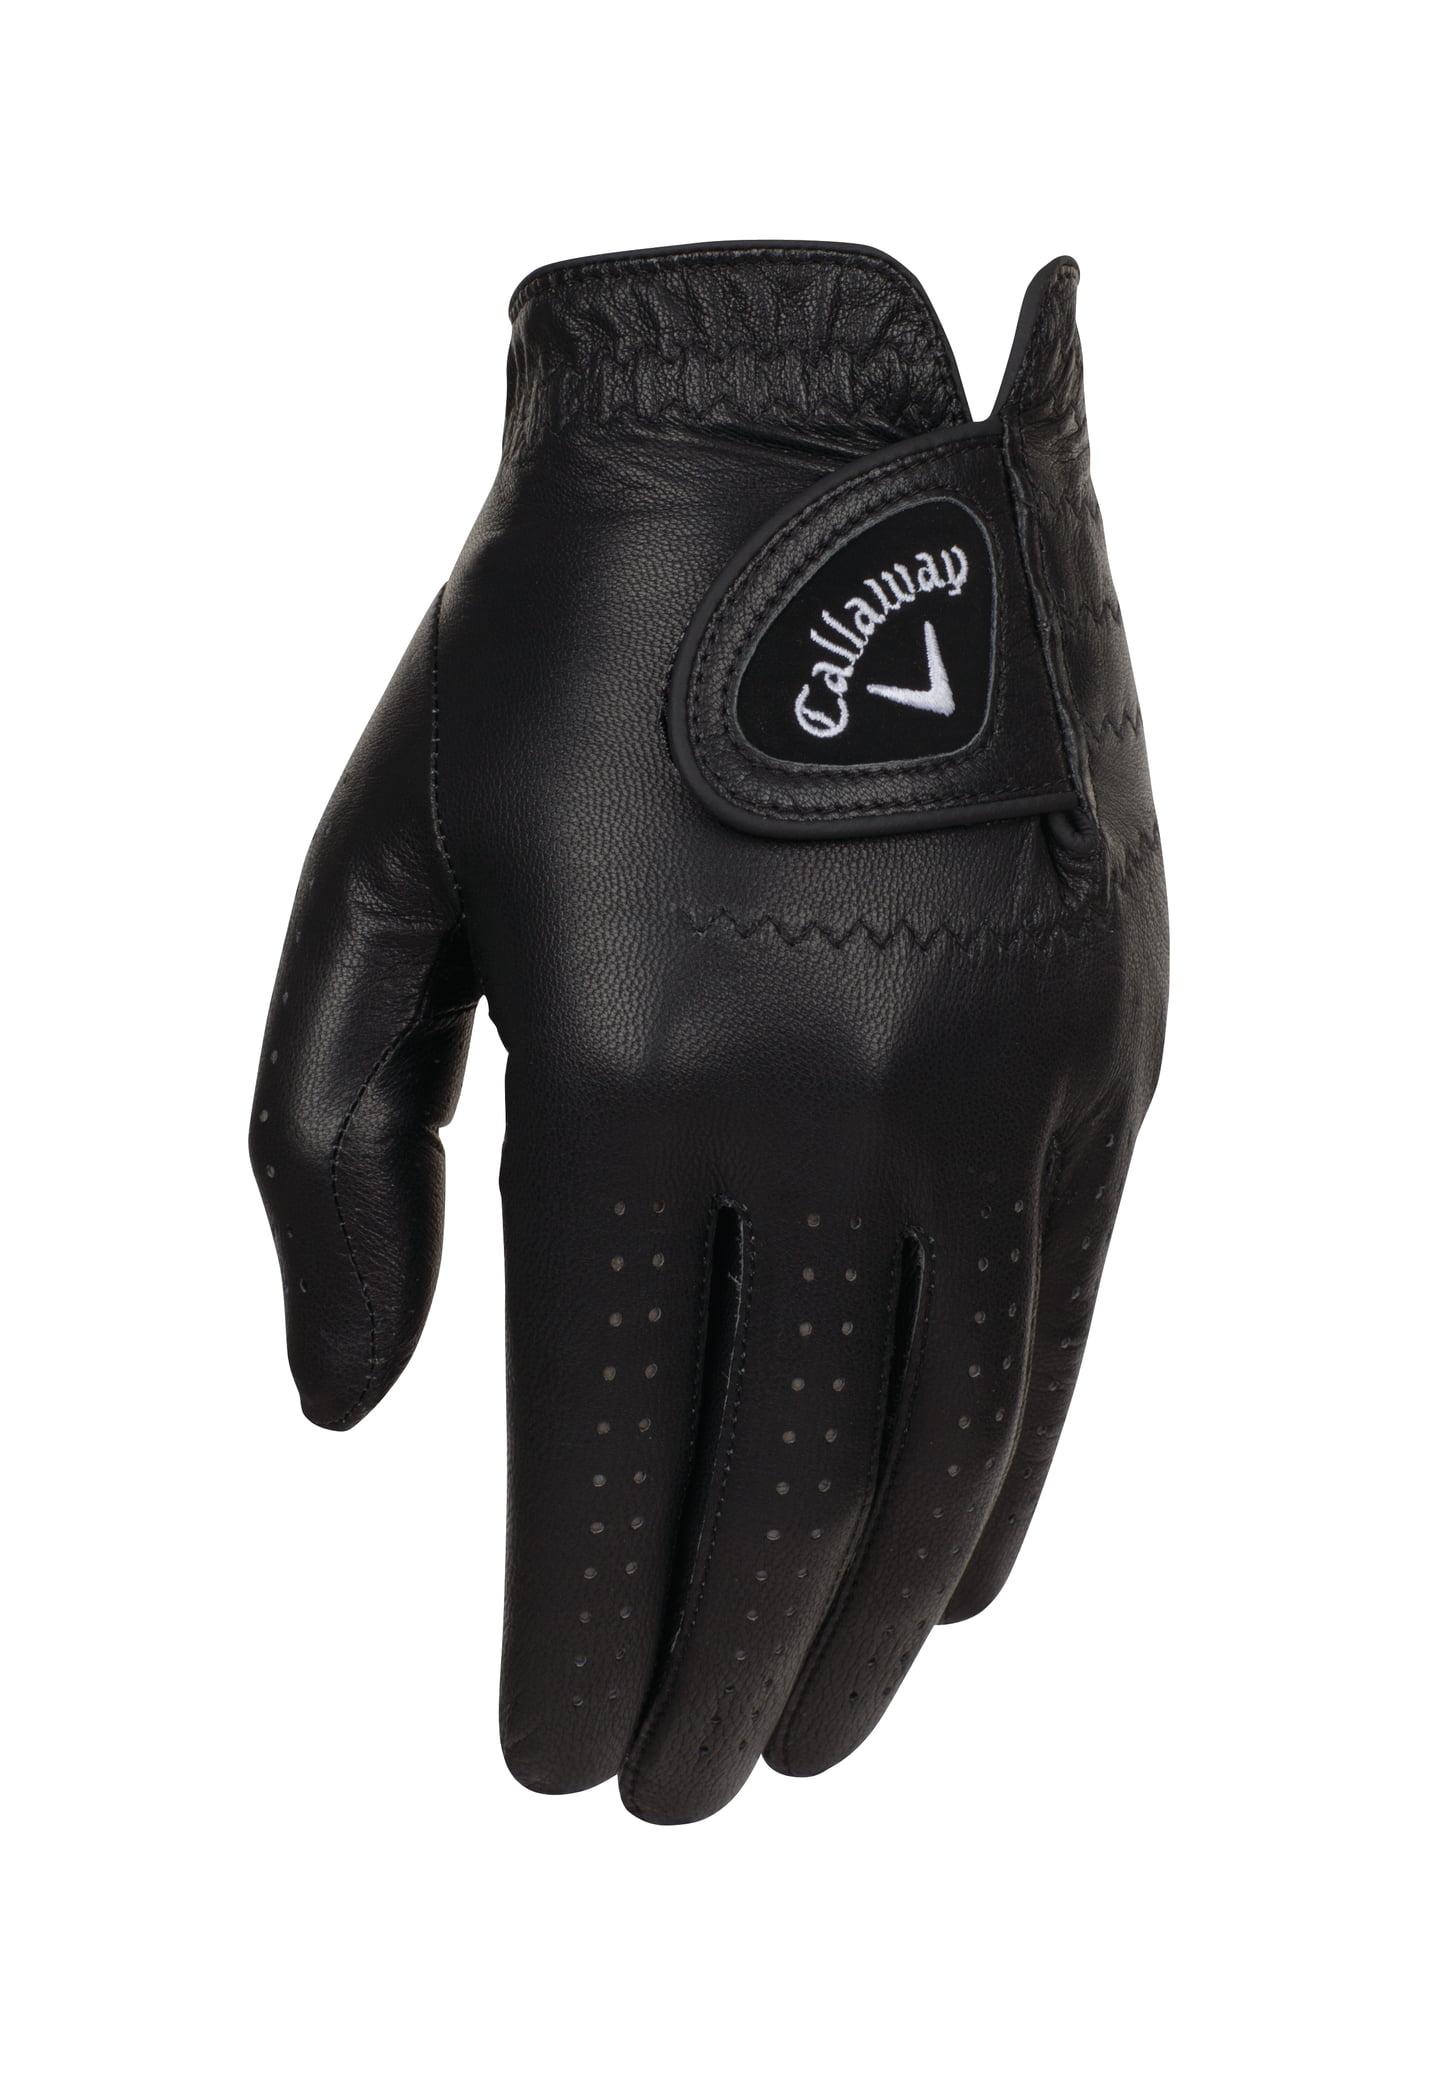 NEW Callaway Opti-Color Black Men's Regular Left Large Golf Glove